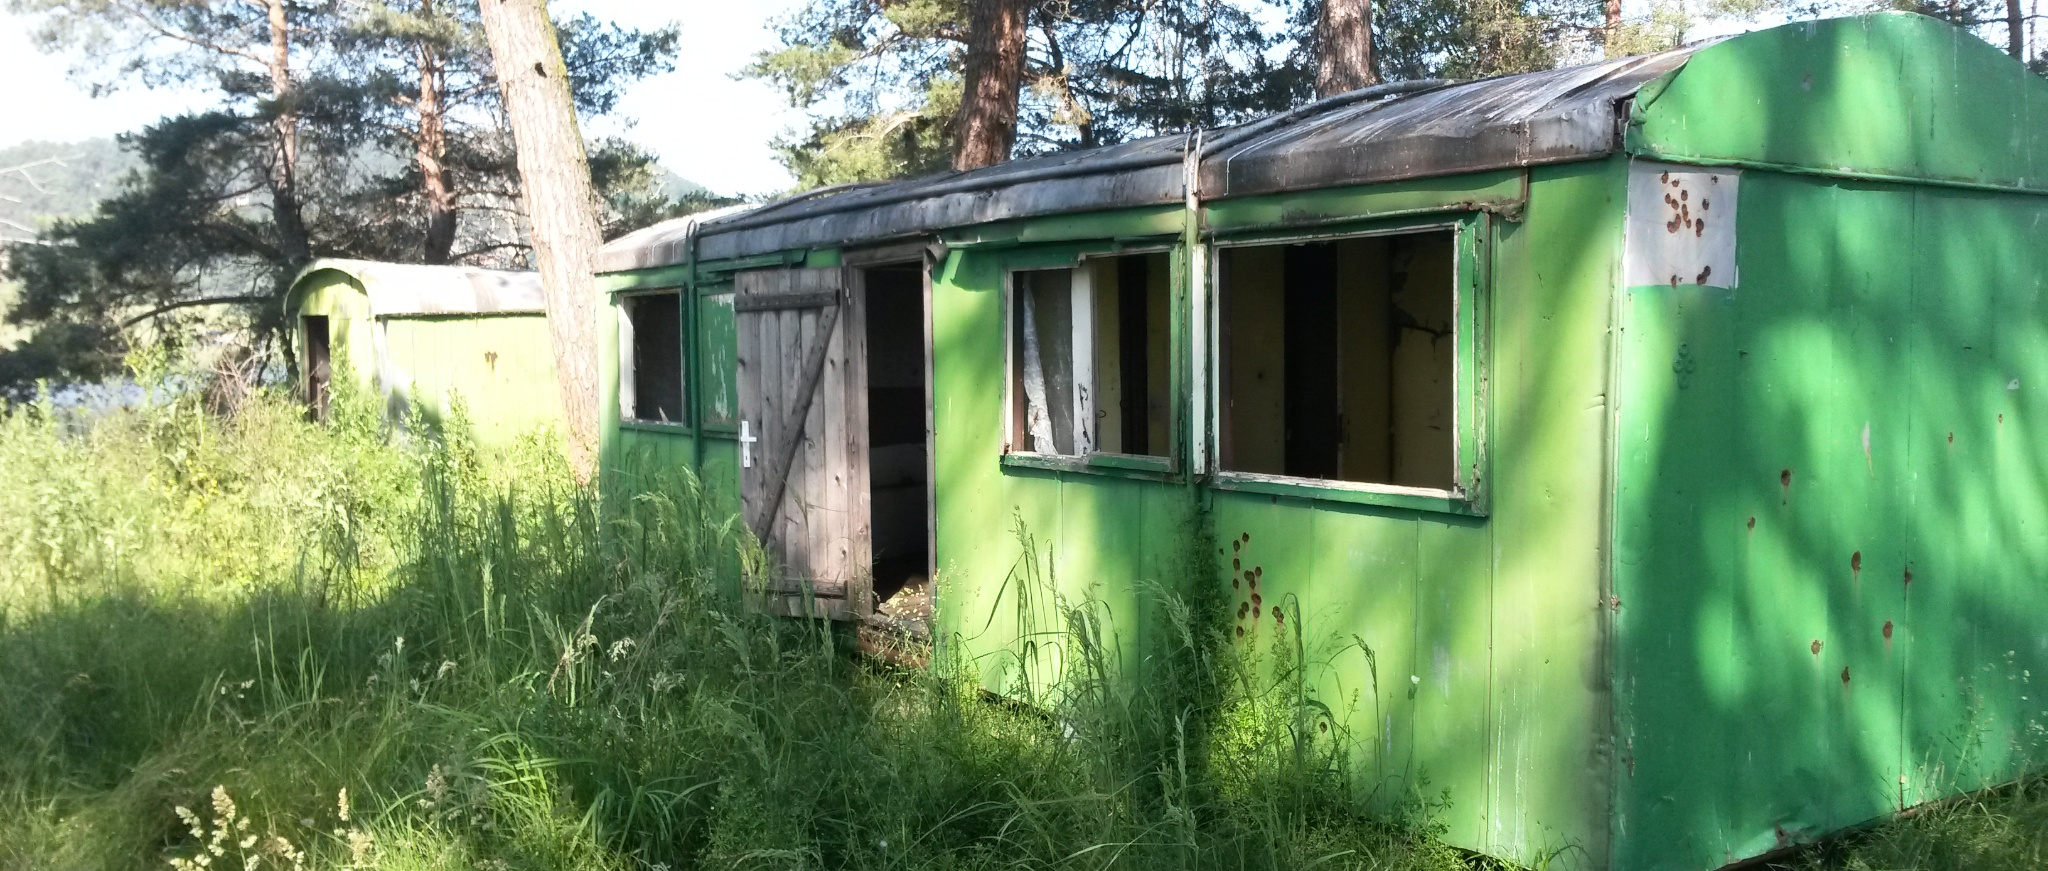 ex-military caravans